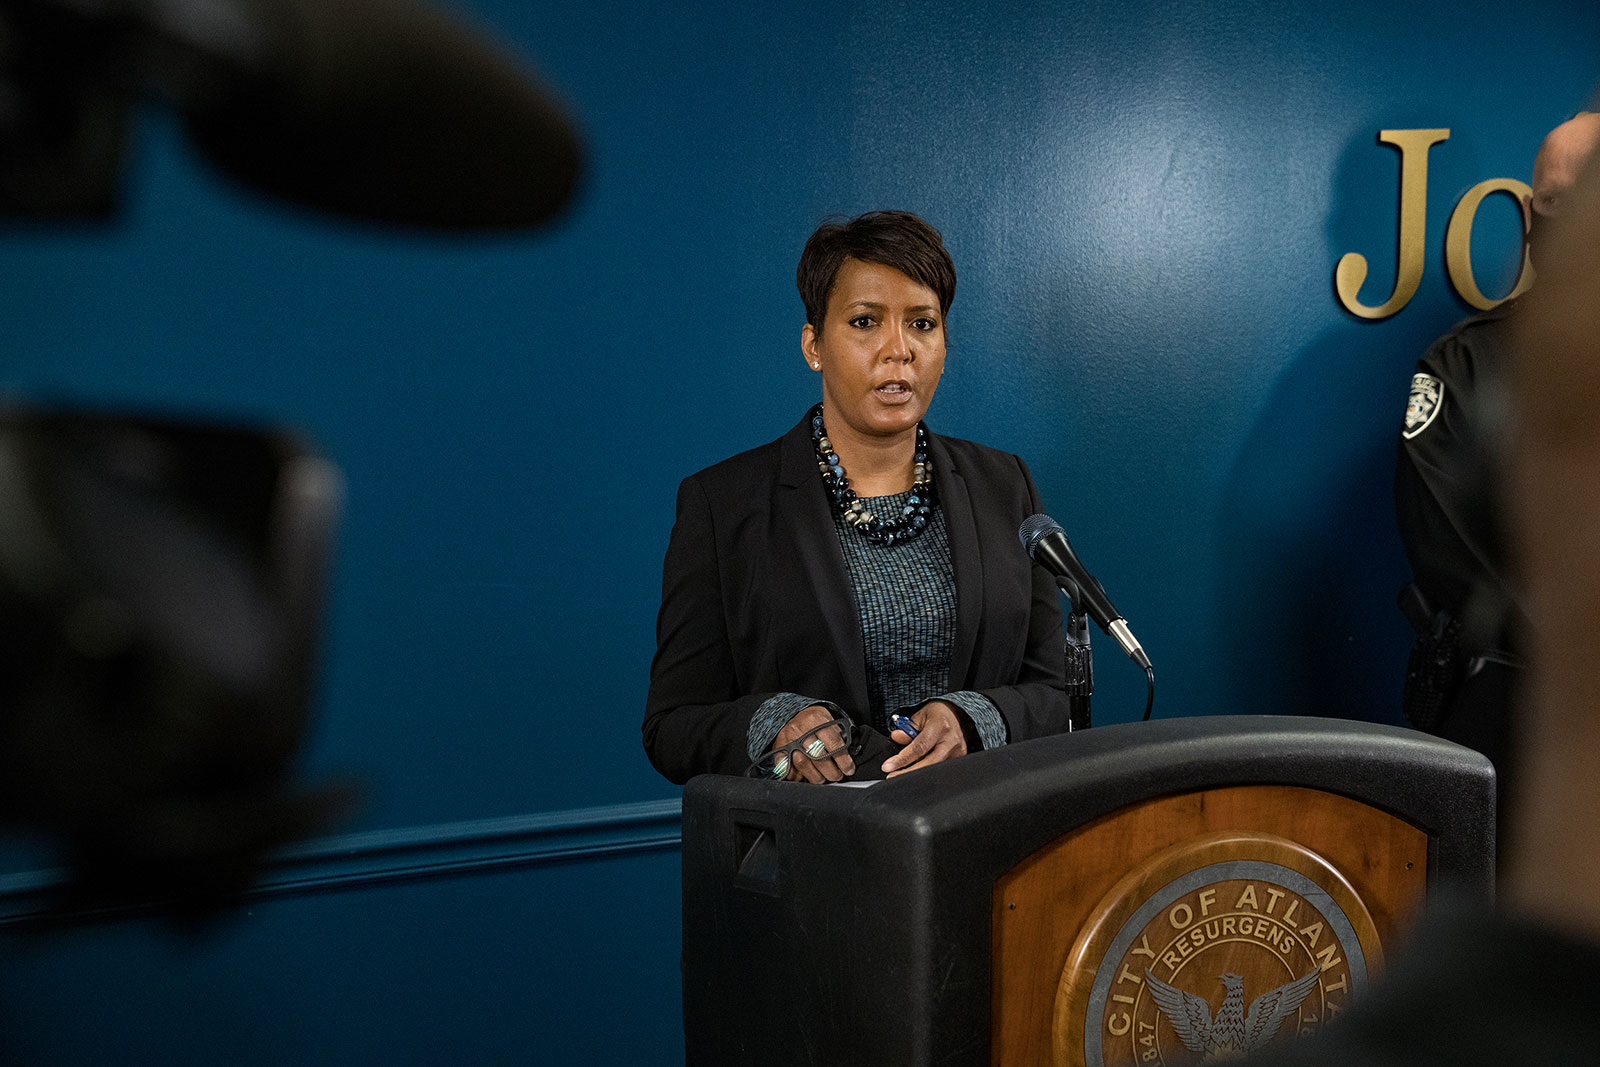 Atlanta Mayor Keisha Lance Bottoms speaks at a press conference on March 17.